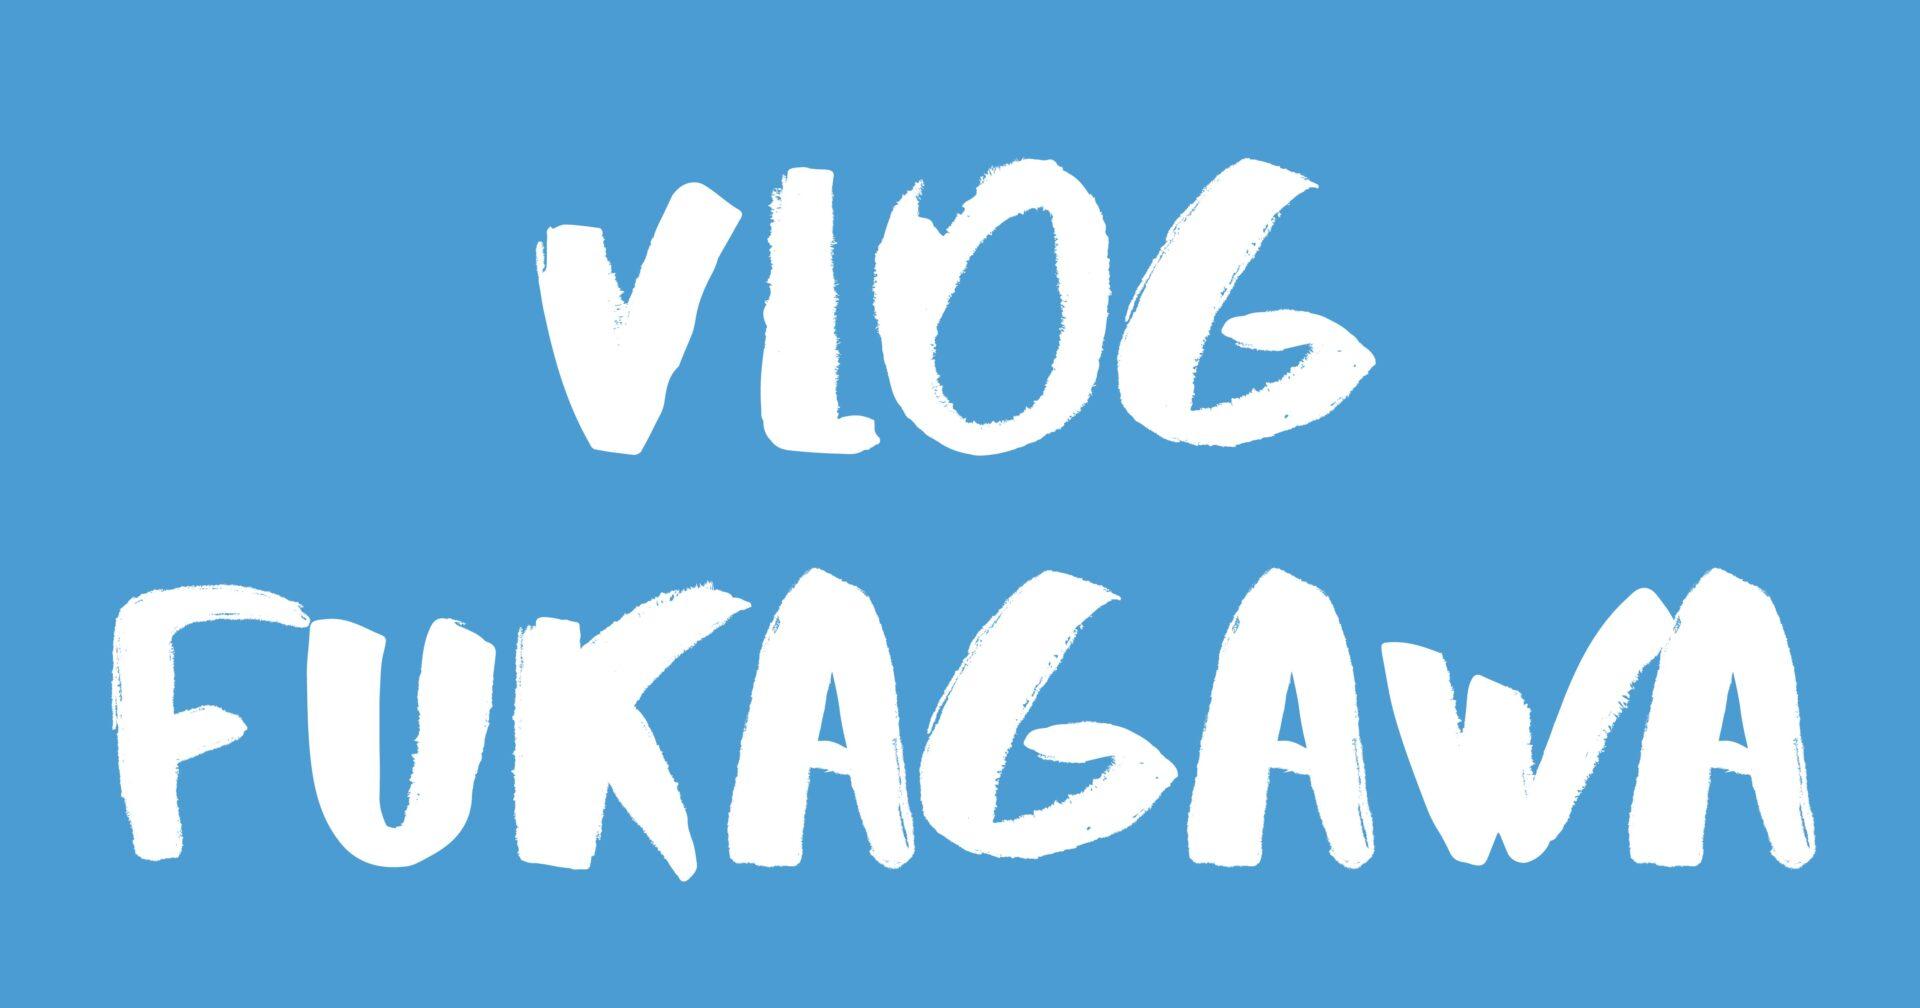 [Vlog] 深川 / Fukagawa